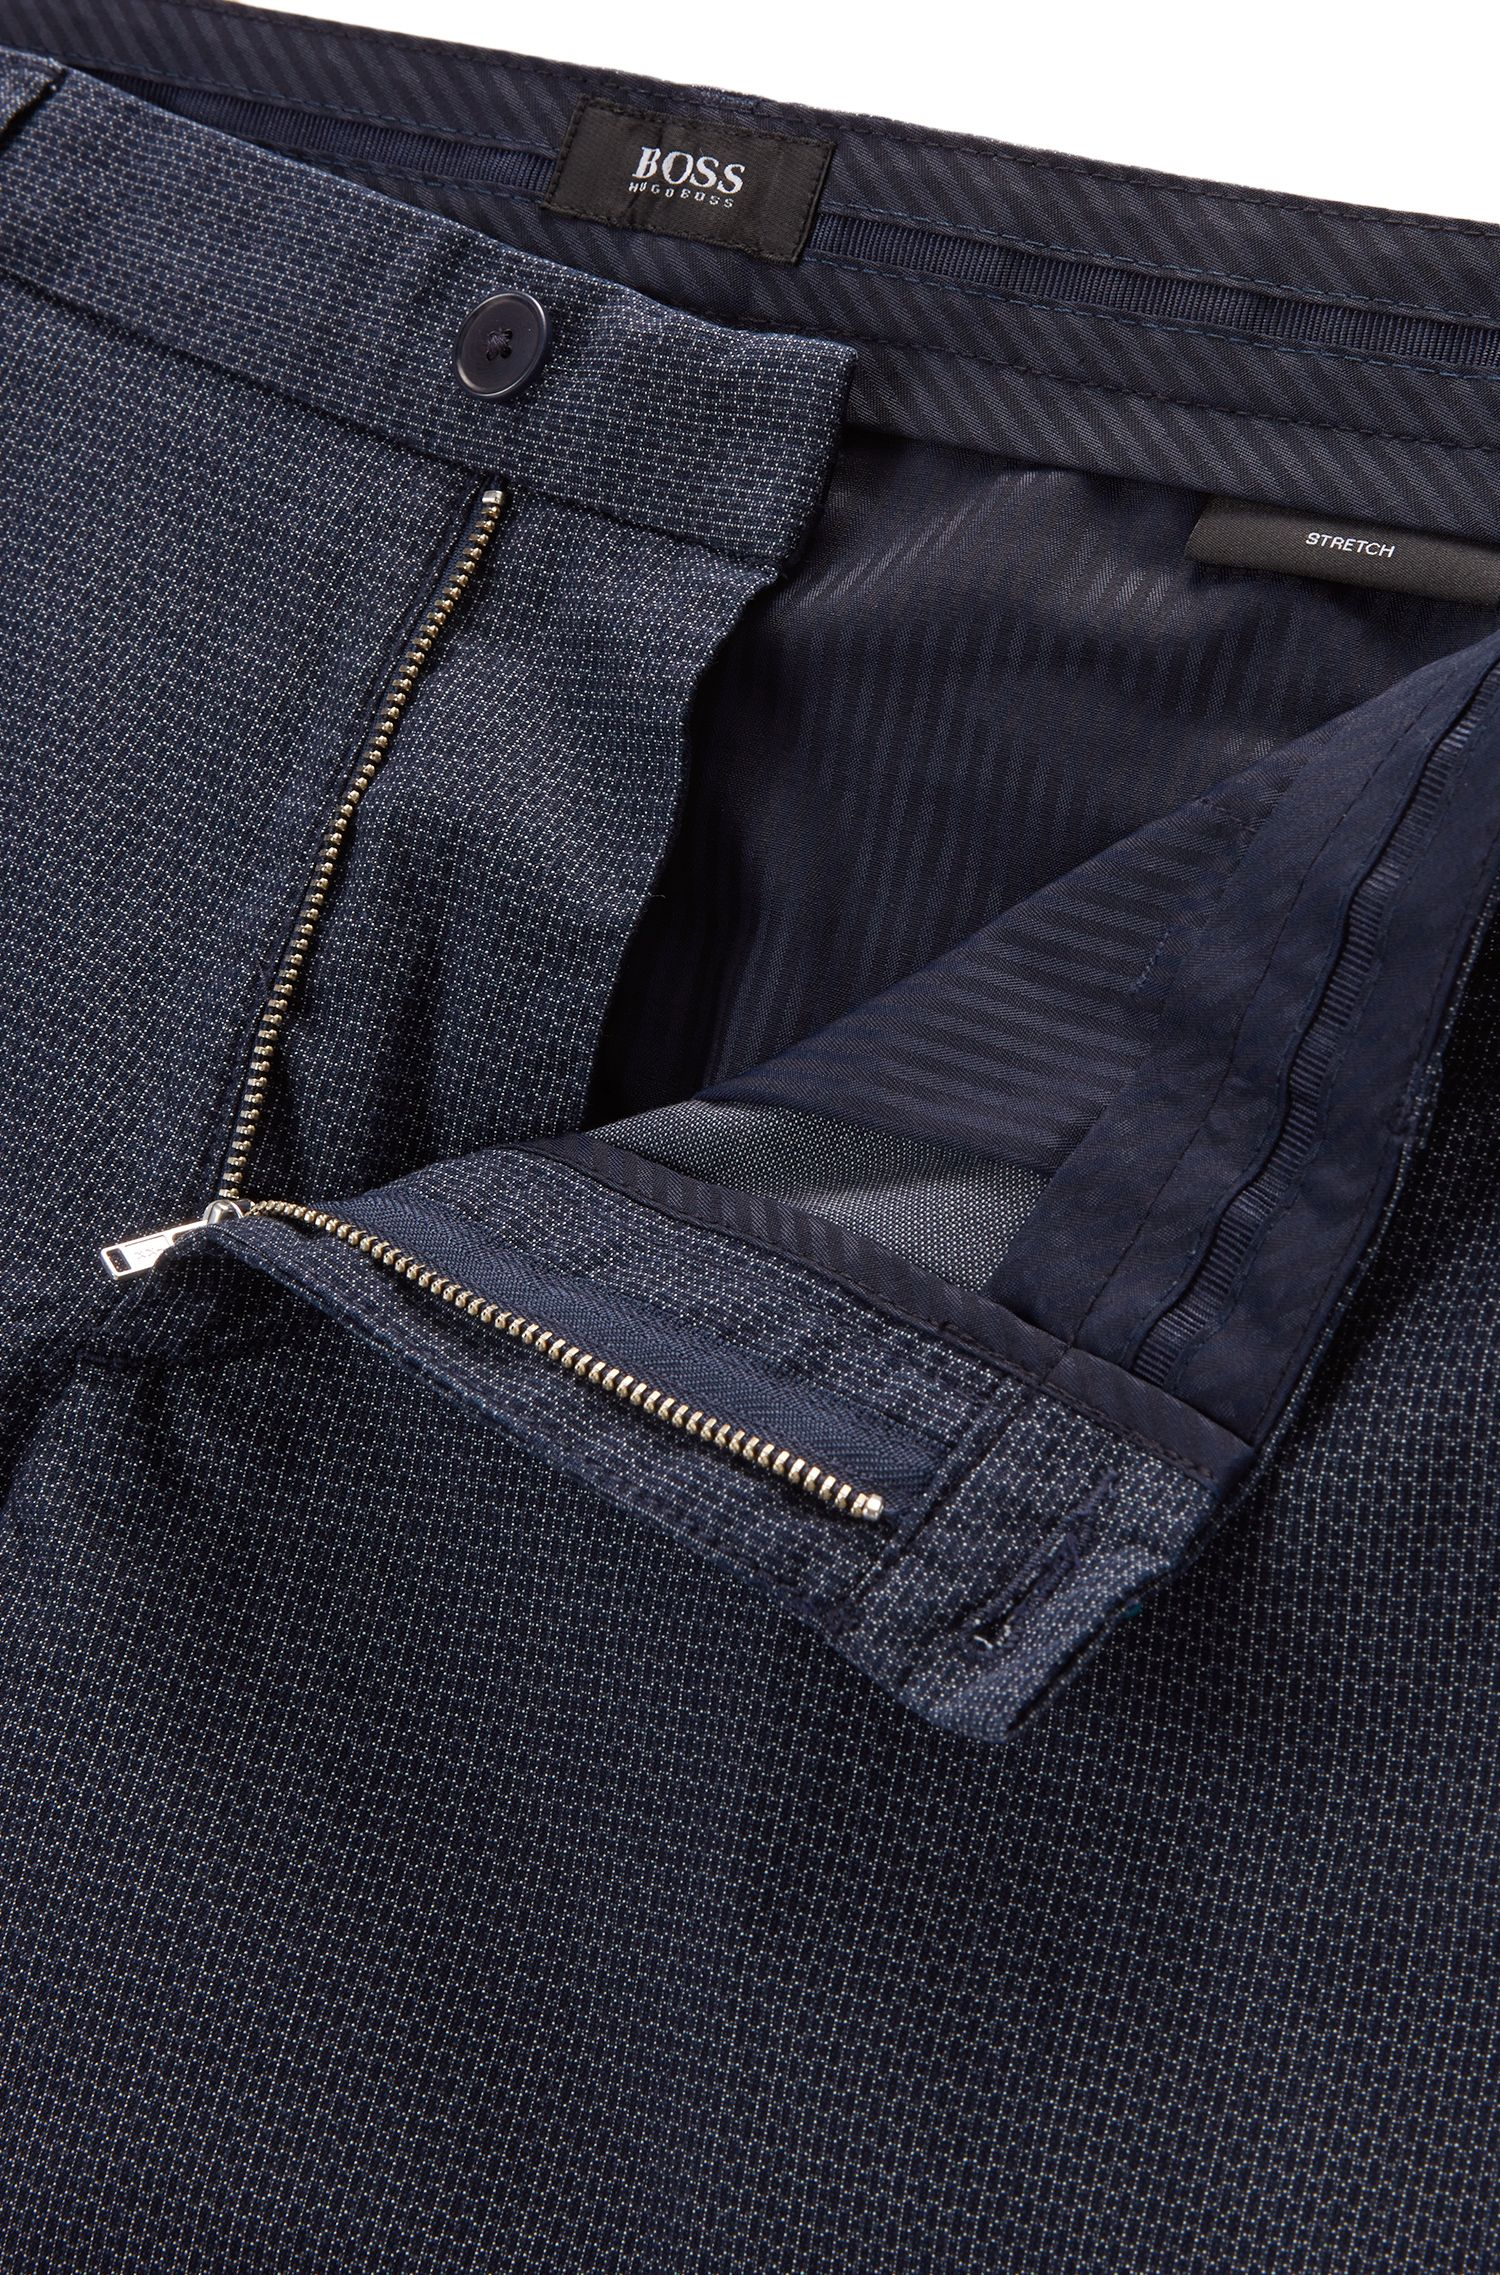 Italian Stretch Cotton Shorts, Slim Fit | Rice Short W, Dark Blue